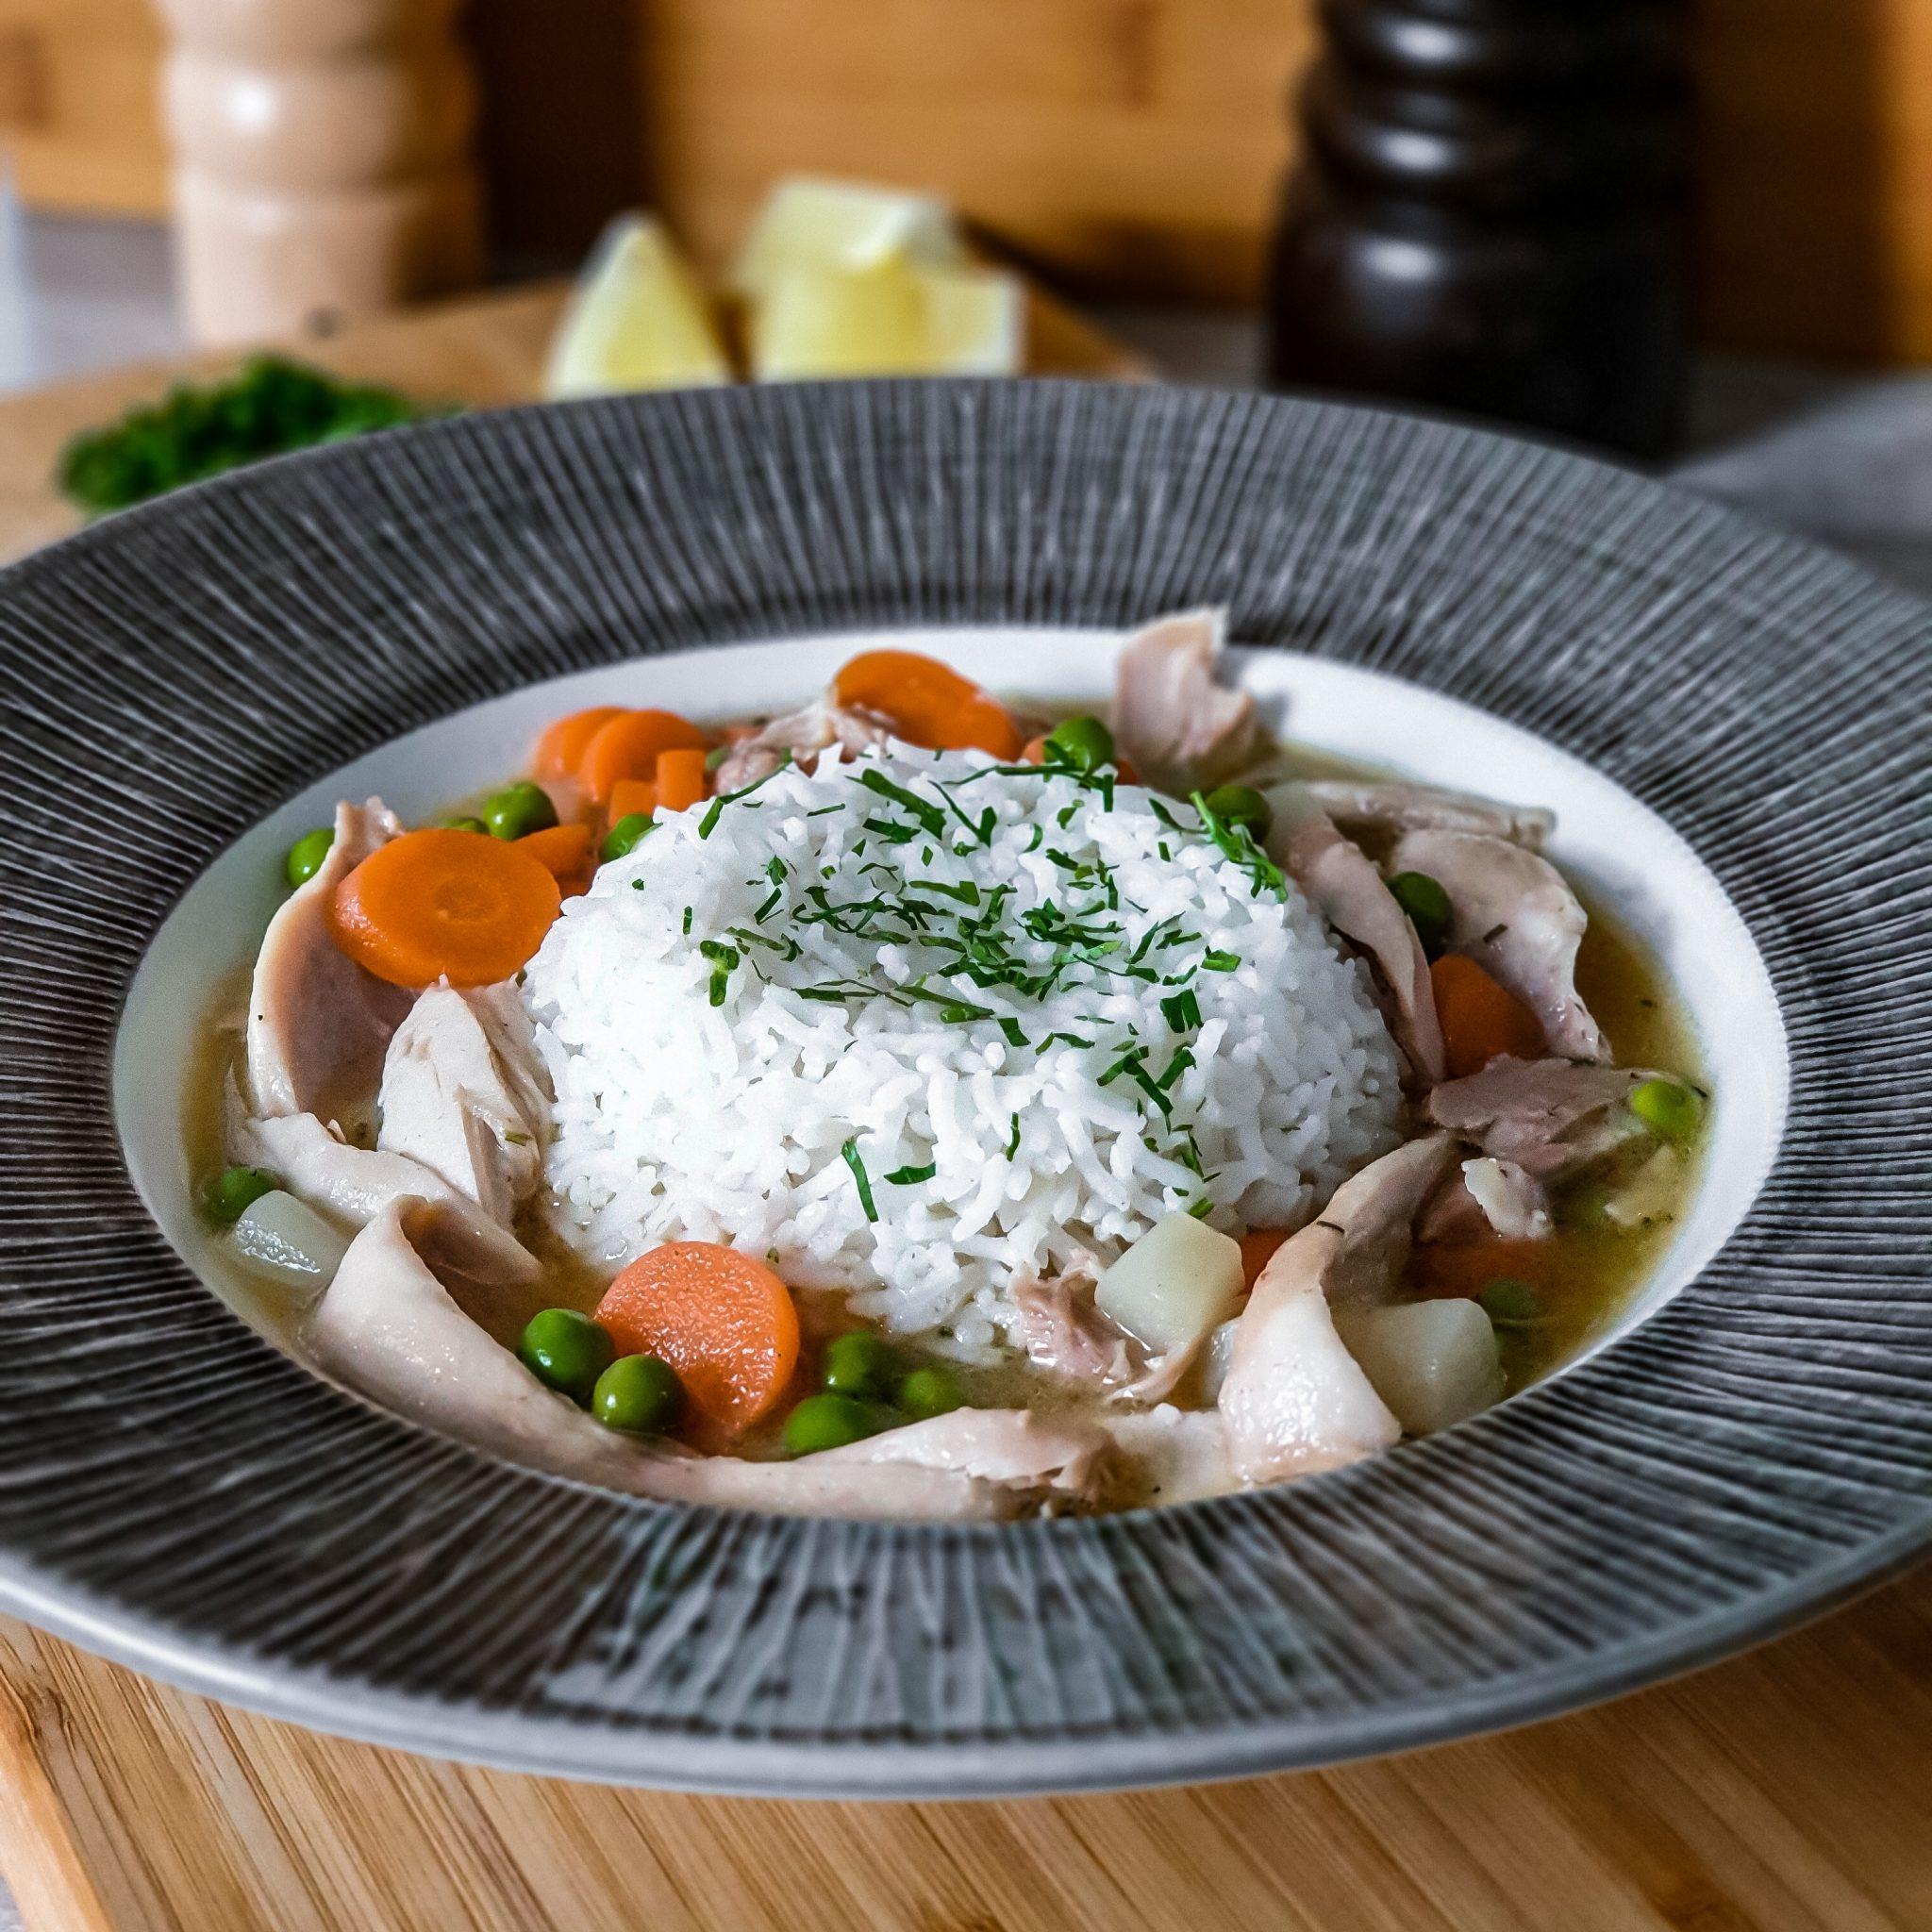 Hühnerfrikassee mit Reis ein Klassiker